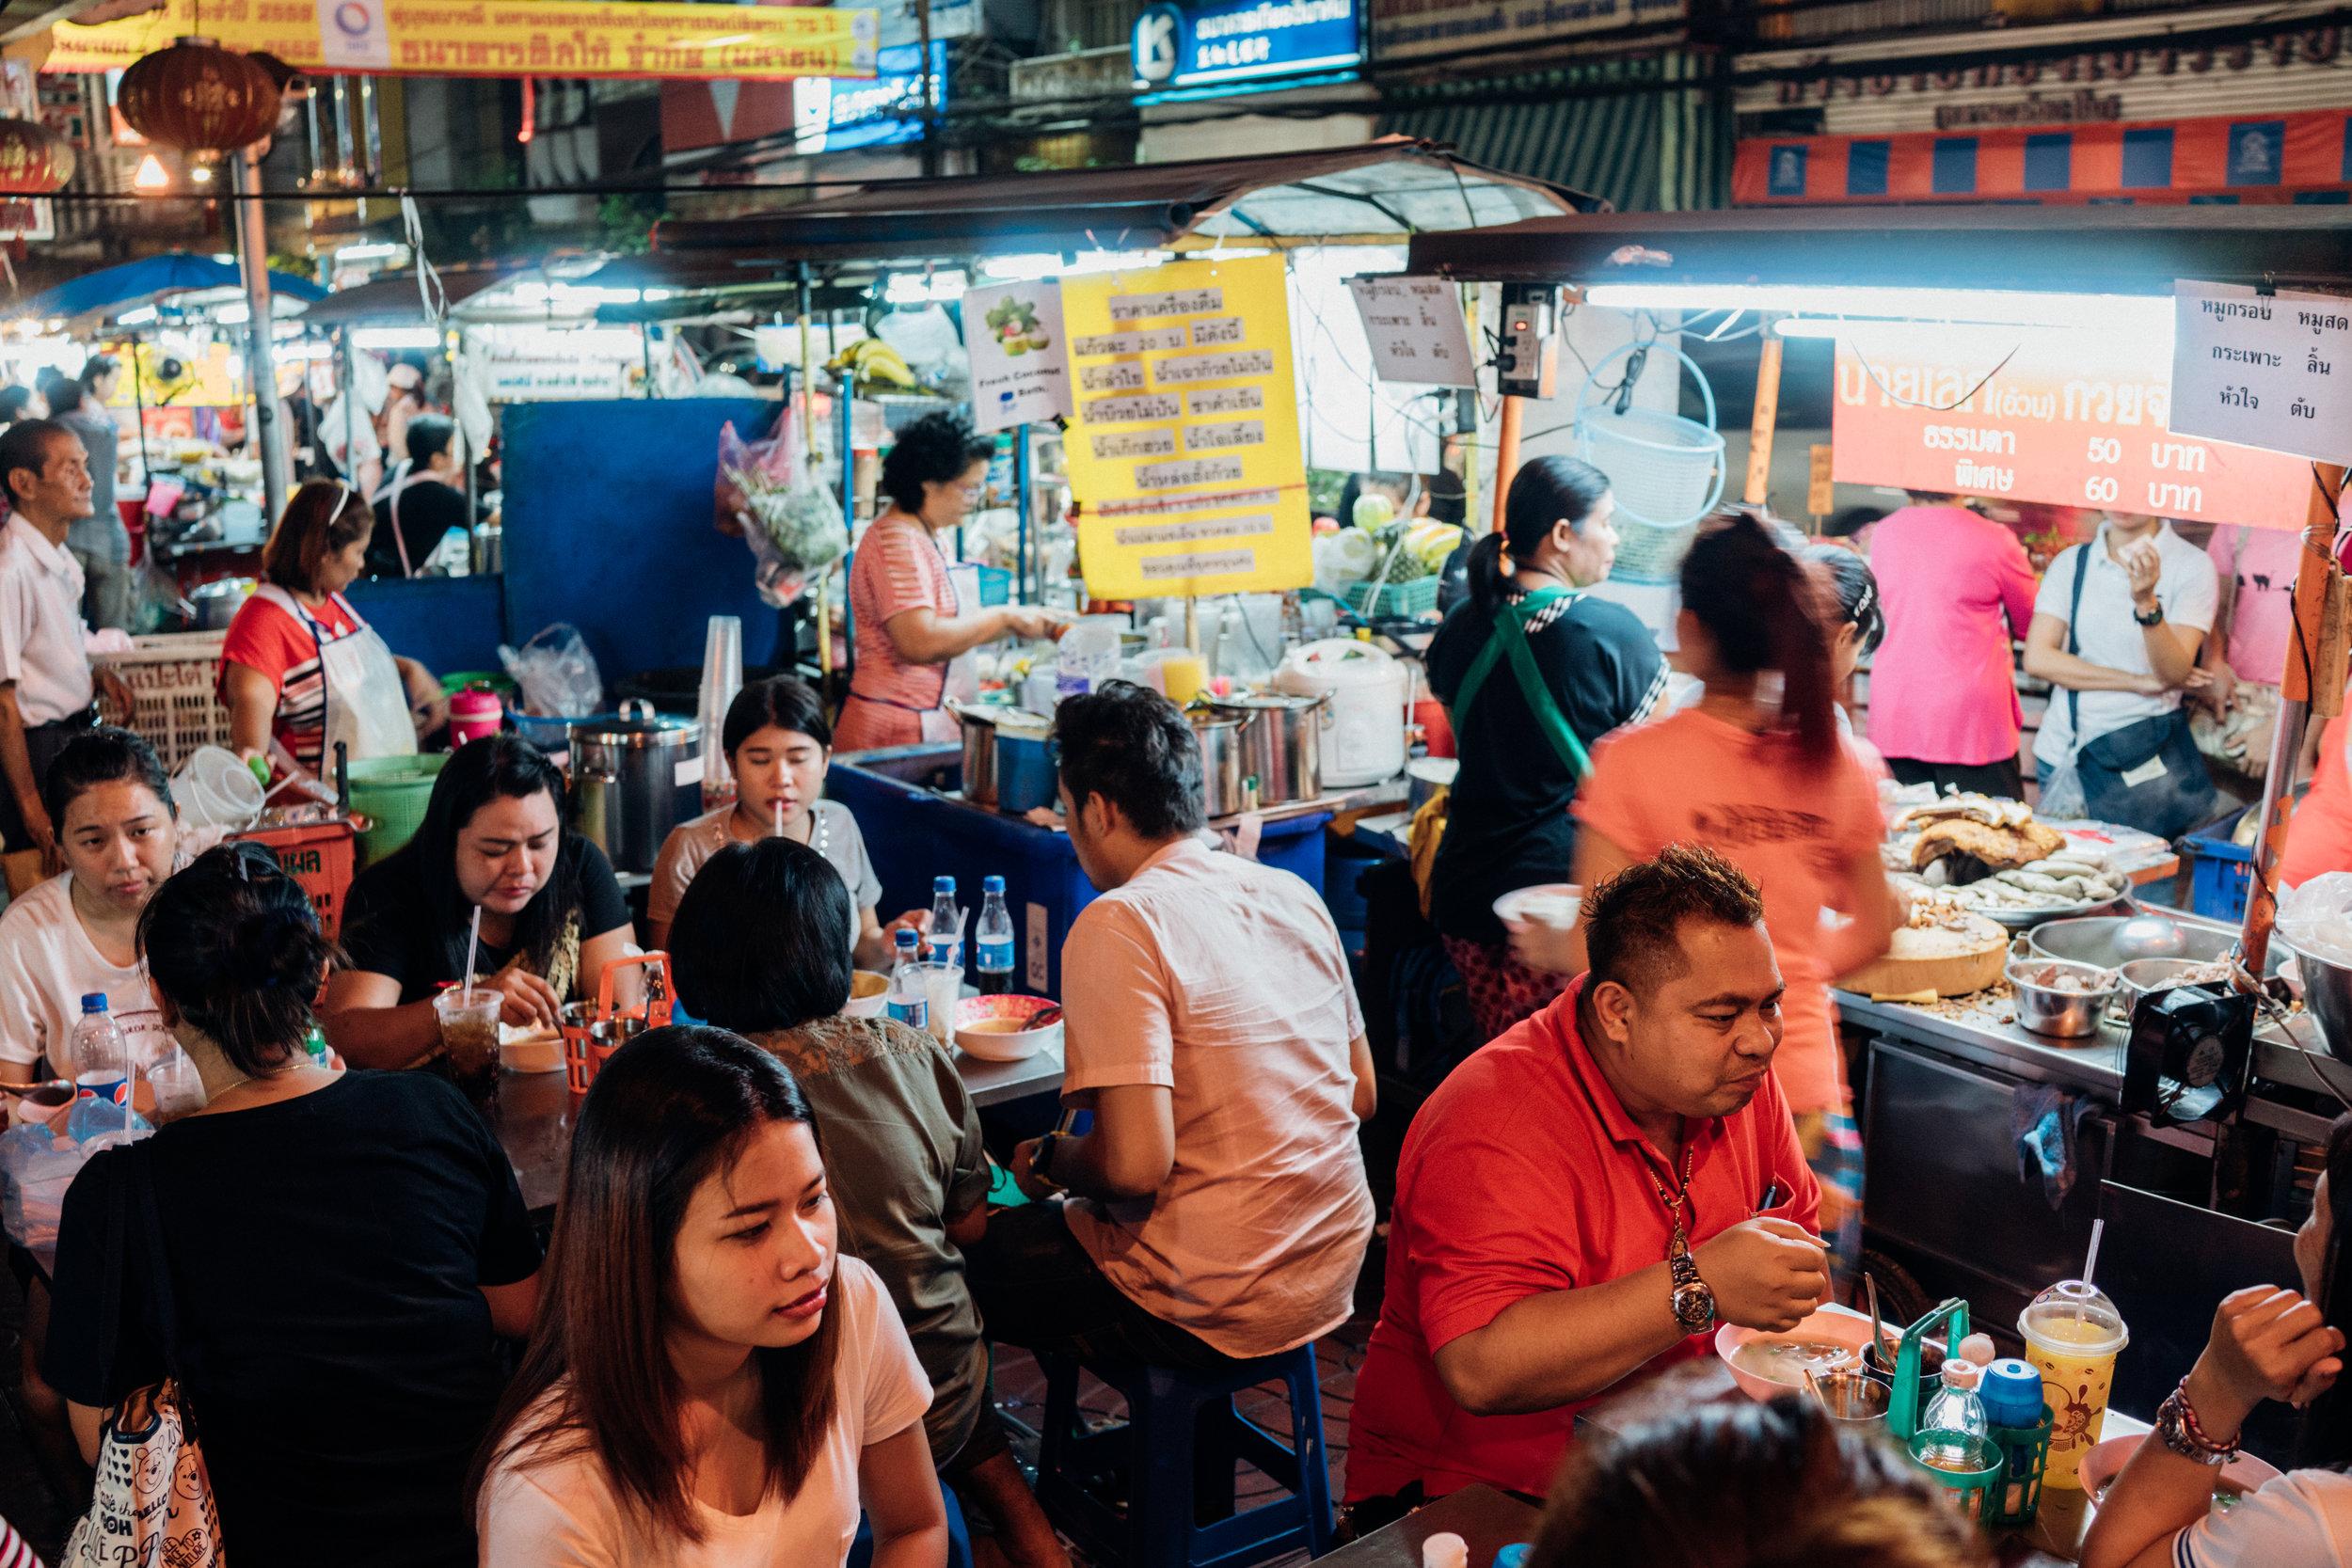 The crowd at  Kuay Jab Nay Lek on a Sunday night in Bangkok's Chinatown